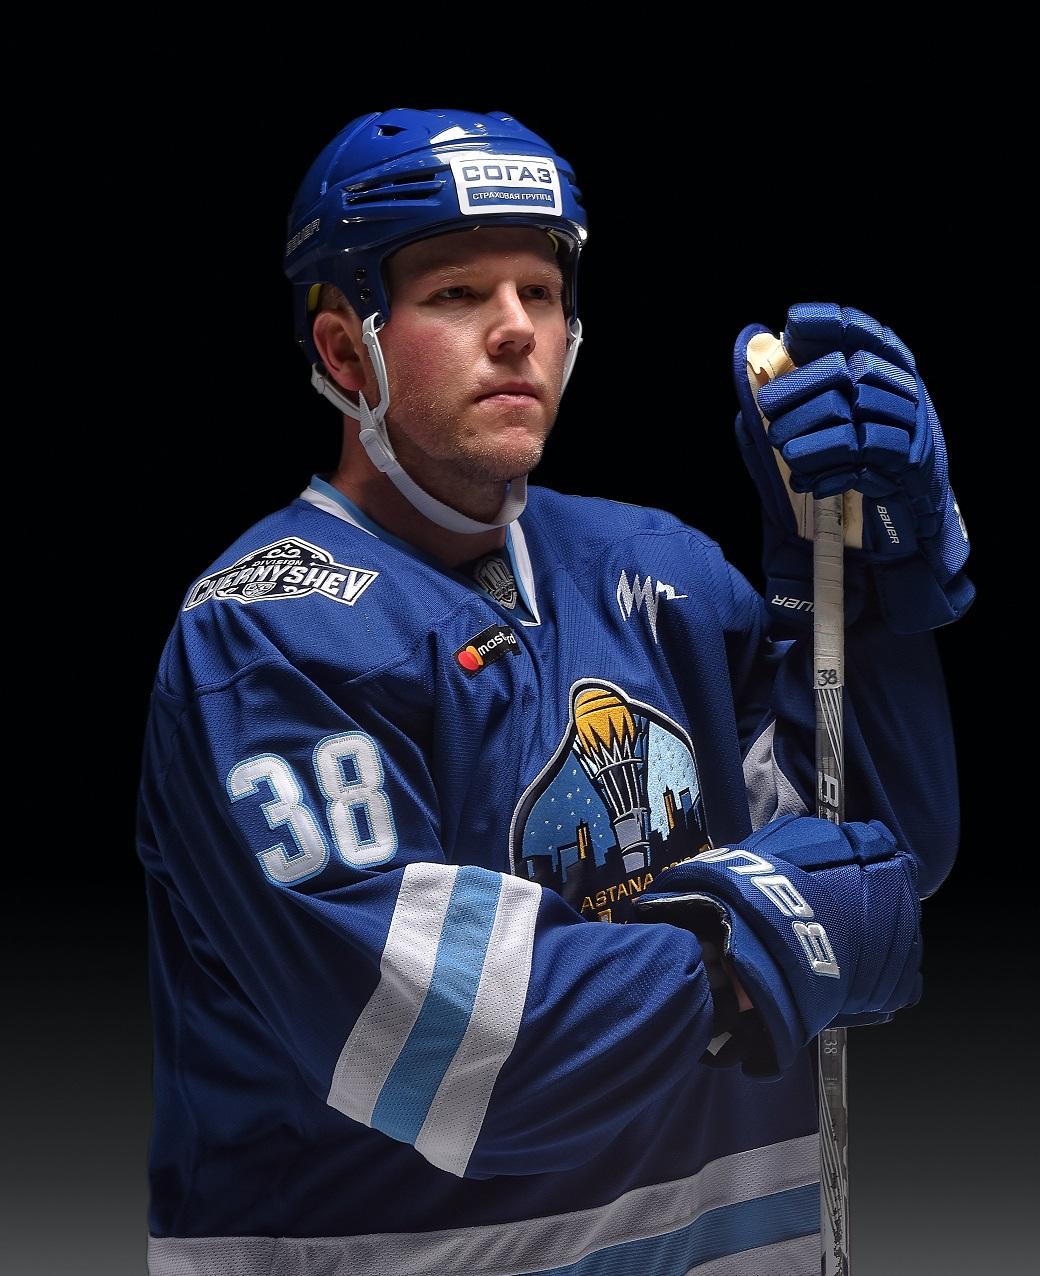 All-Star Game uniforms unveiled   News   Kontinental Hockey League (KHL) 807575f7b83